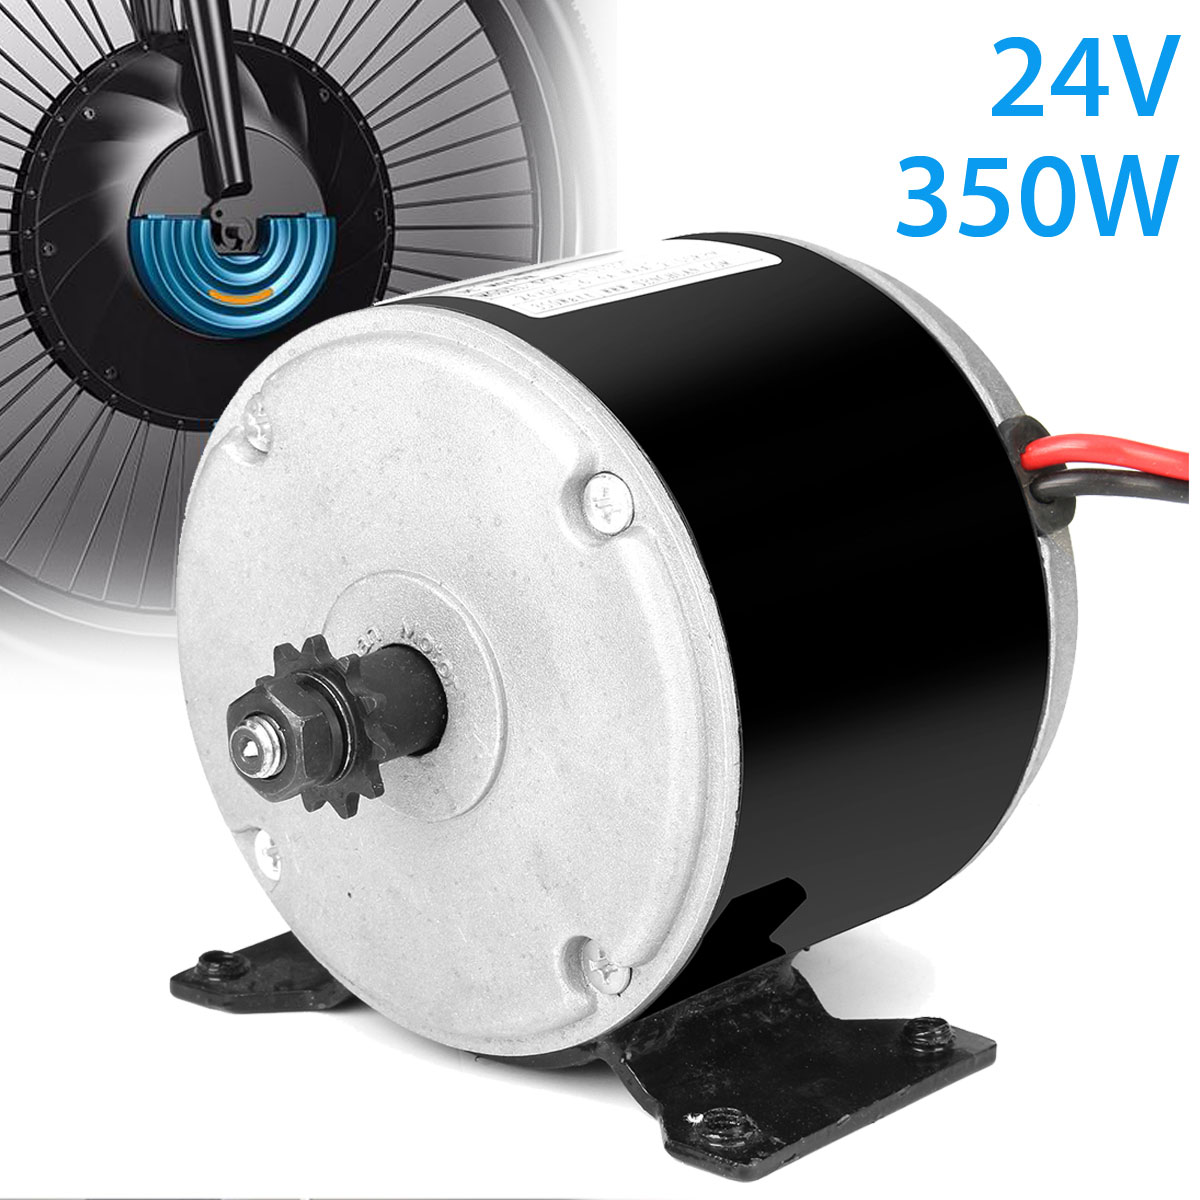 1 pcs Brand New High Quality 24V 350W DC Motor Permanent Magnet Generator Micro Motor for DIY1 pcs Brand New High Quality 24V 350W DC Motor Permanent Magnet Generator Micro Motor for DIY